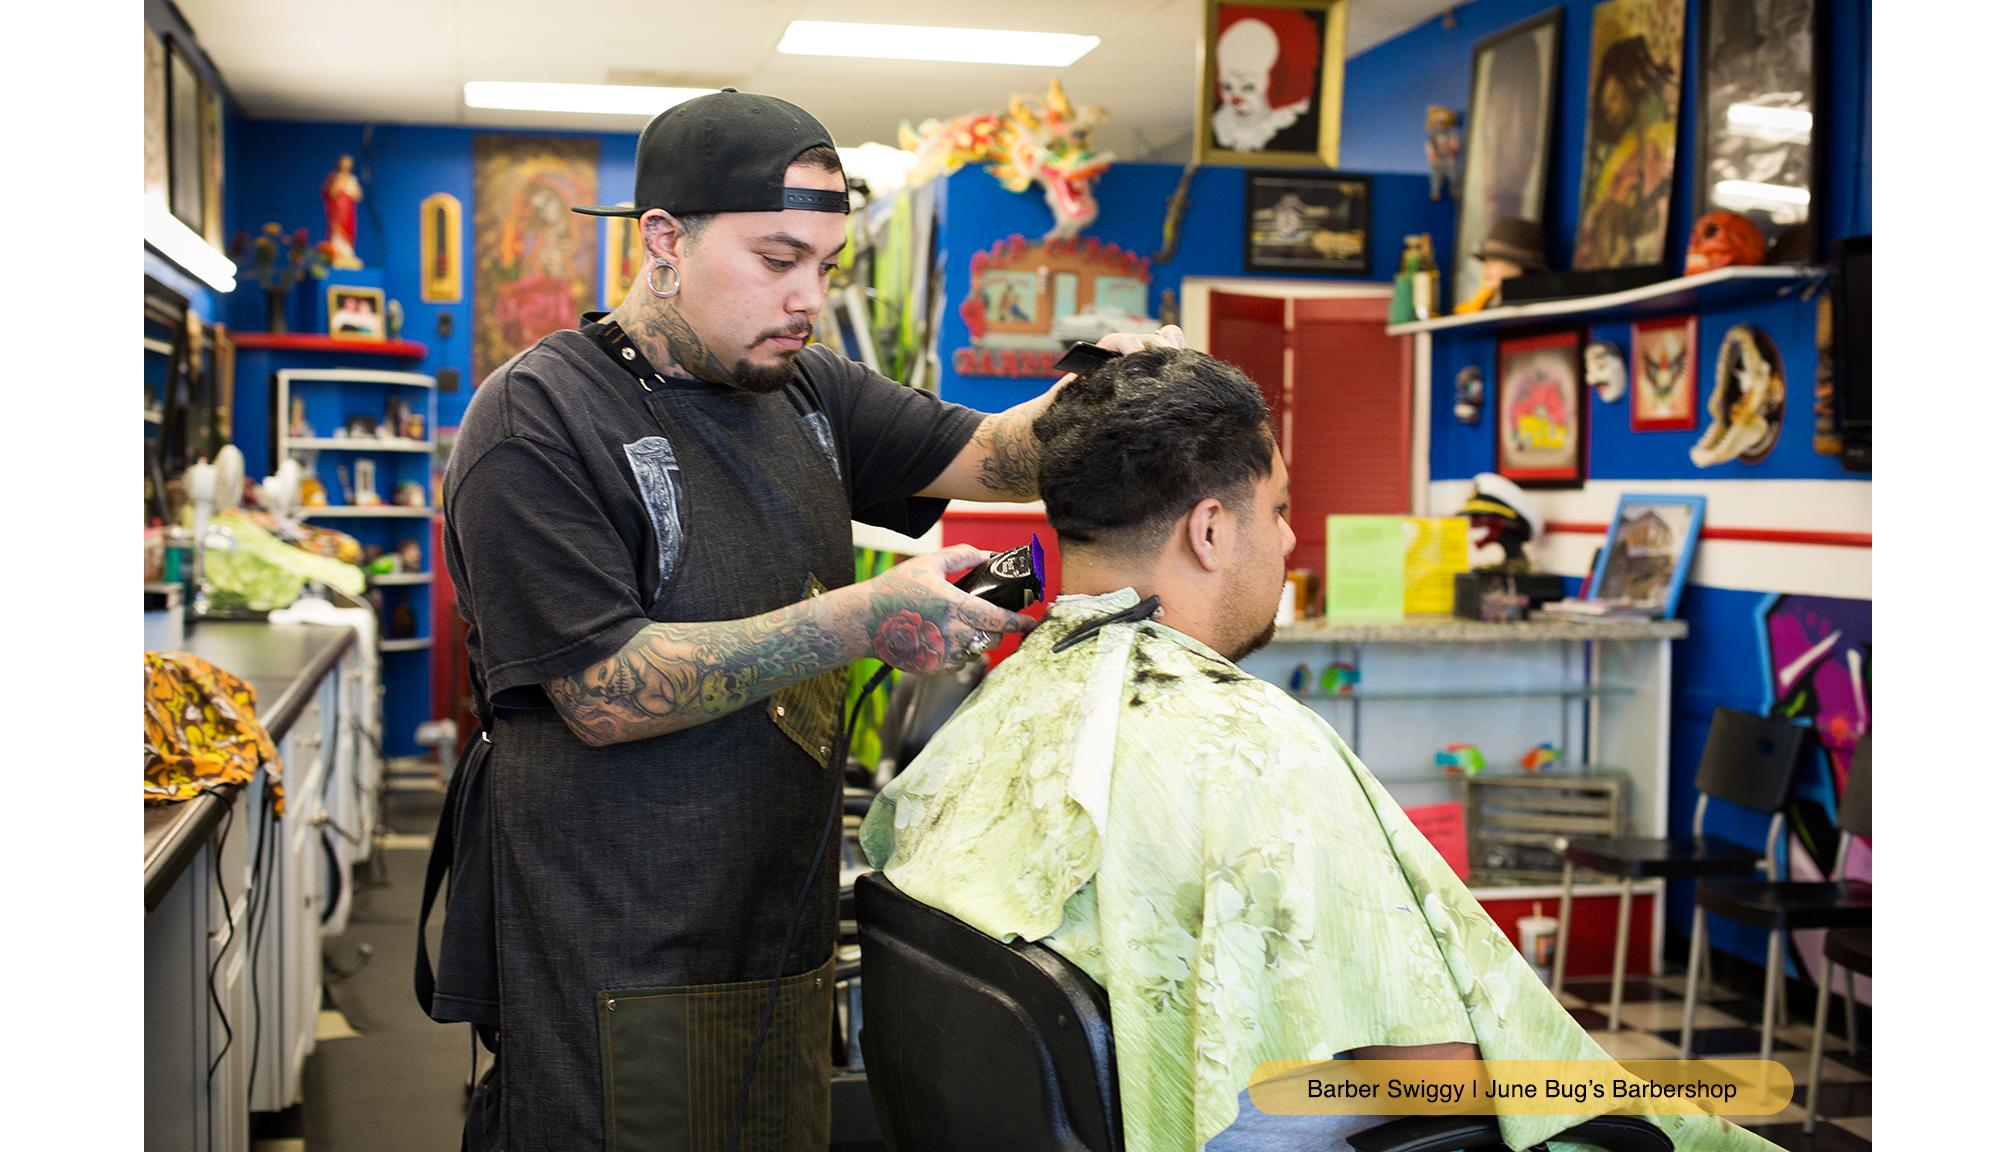 Barbershop04.png